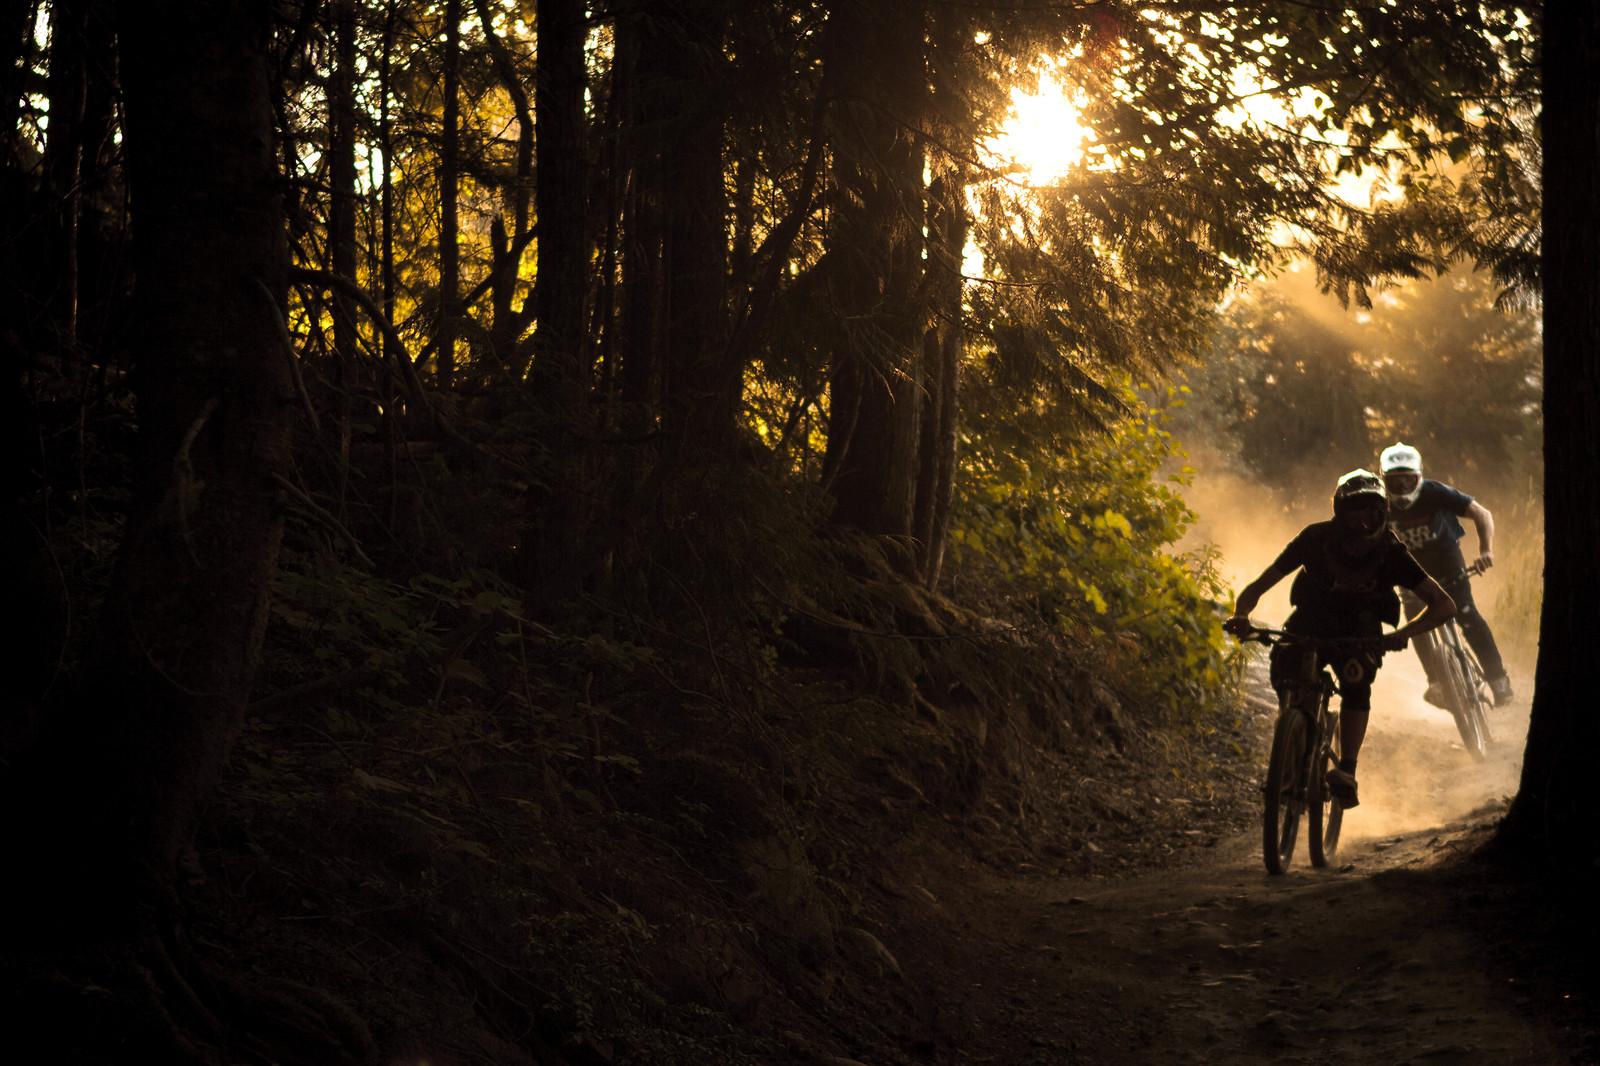 dustytrains  - jamieledson - Mountain Biking Pictures - Vital MTB